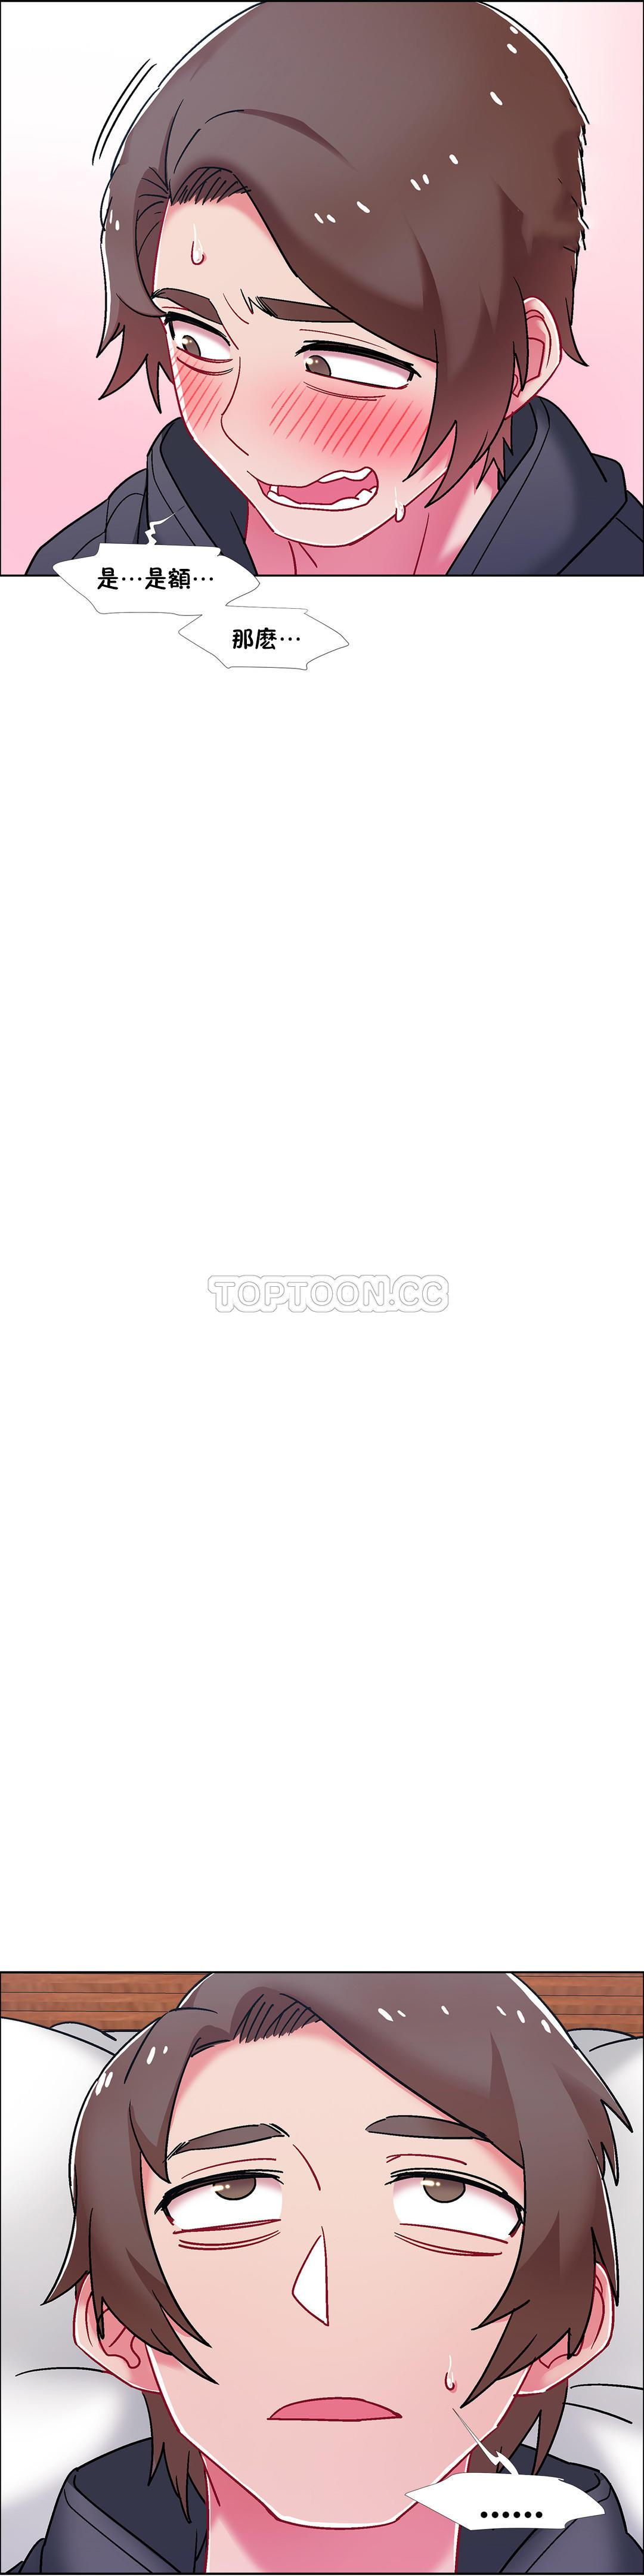 [Studio Wannabe] Rental Girls | 出租女郎 Ch. 33-58 [Chinese]  第二季 完结 401